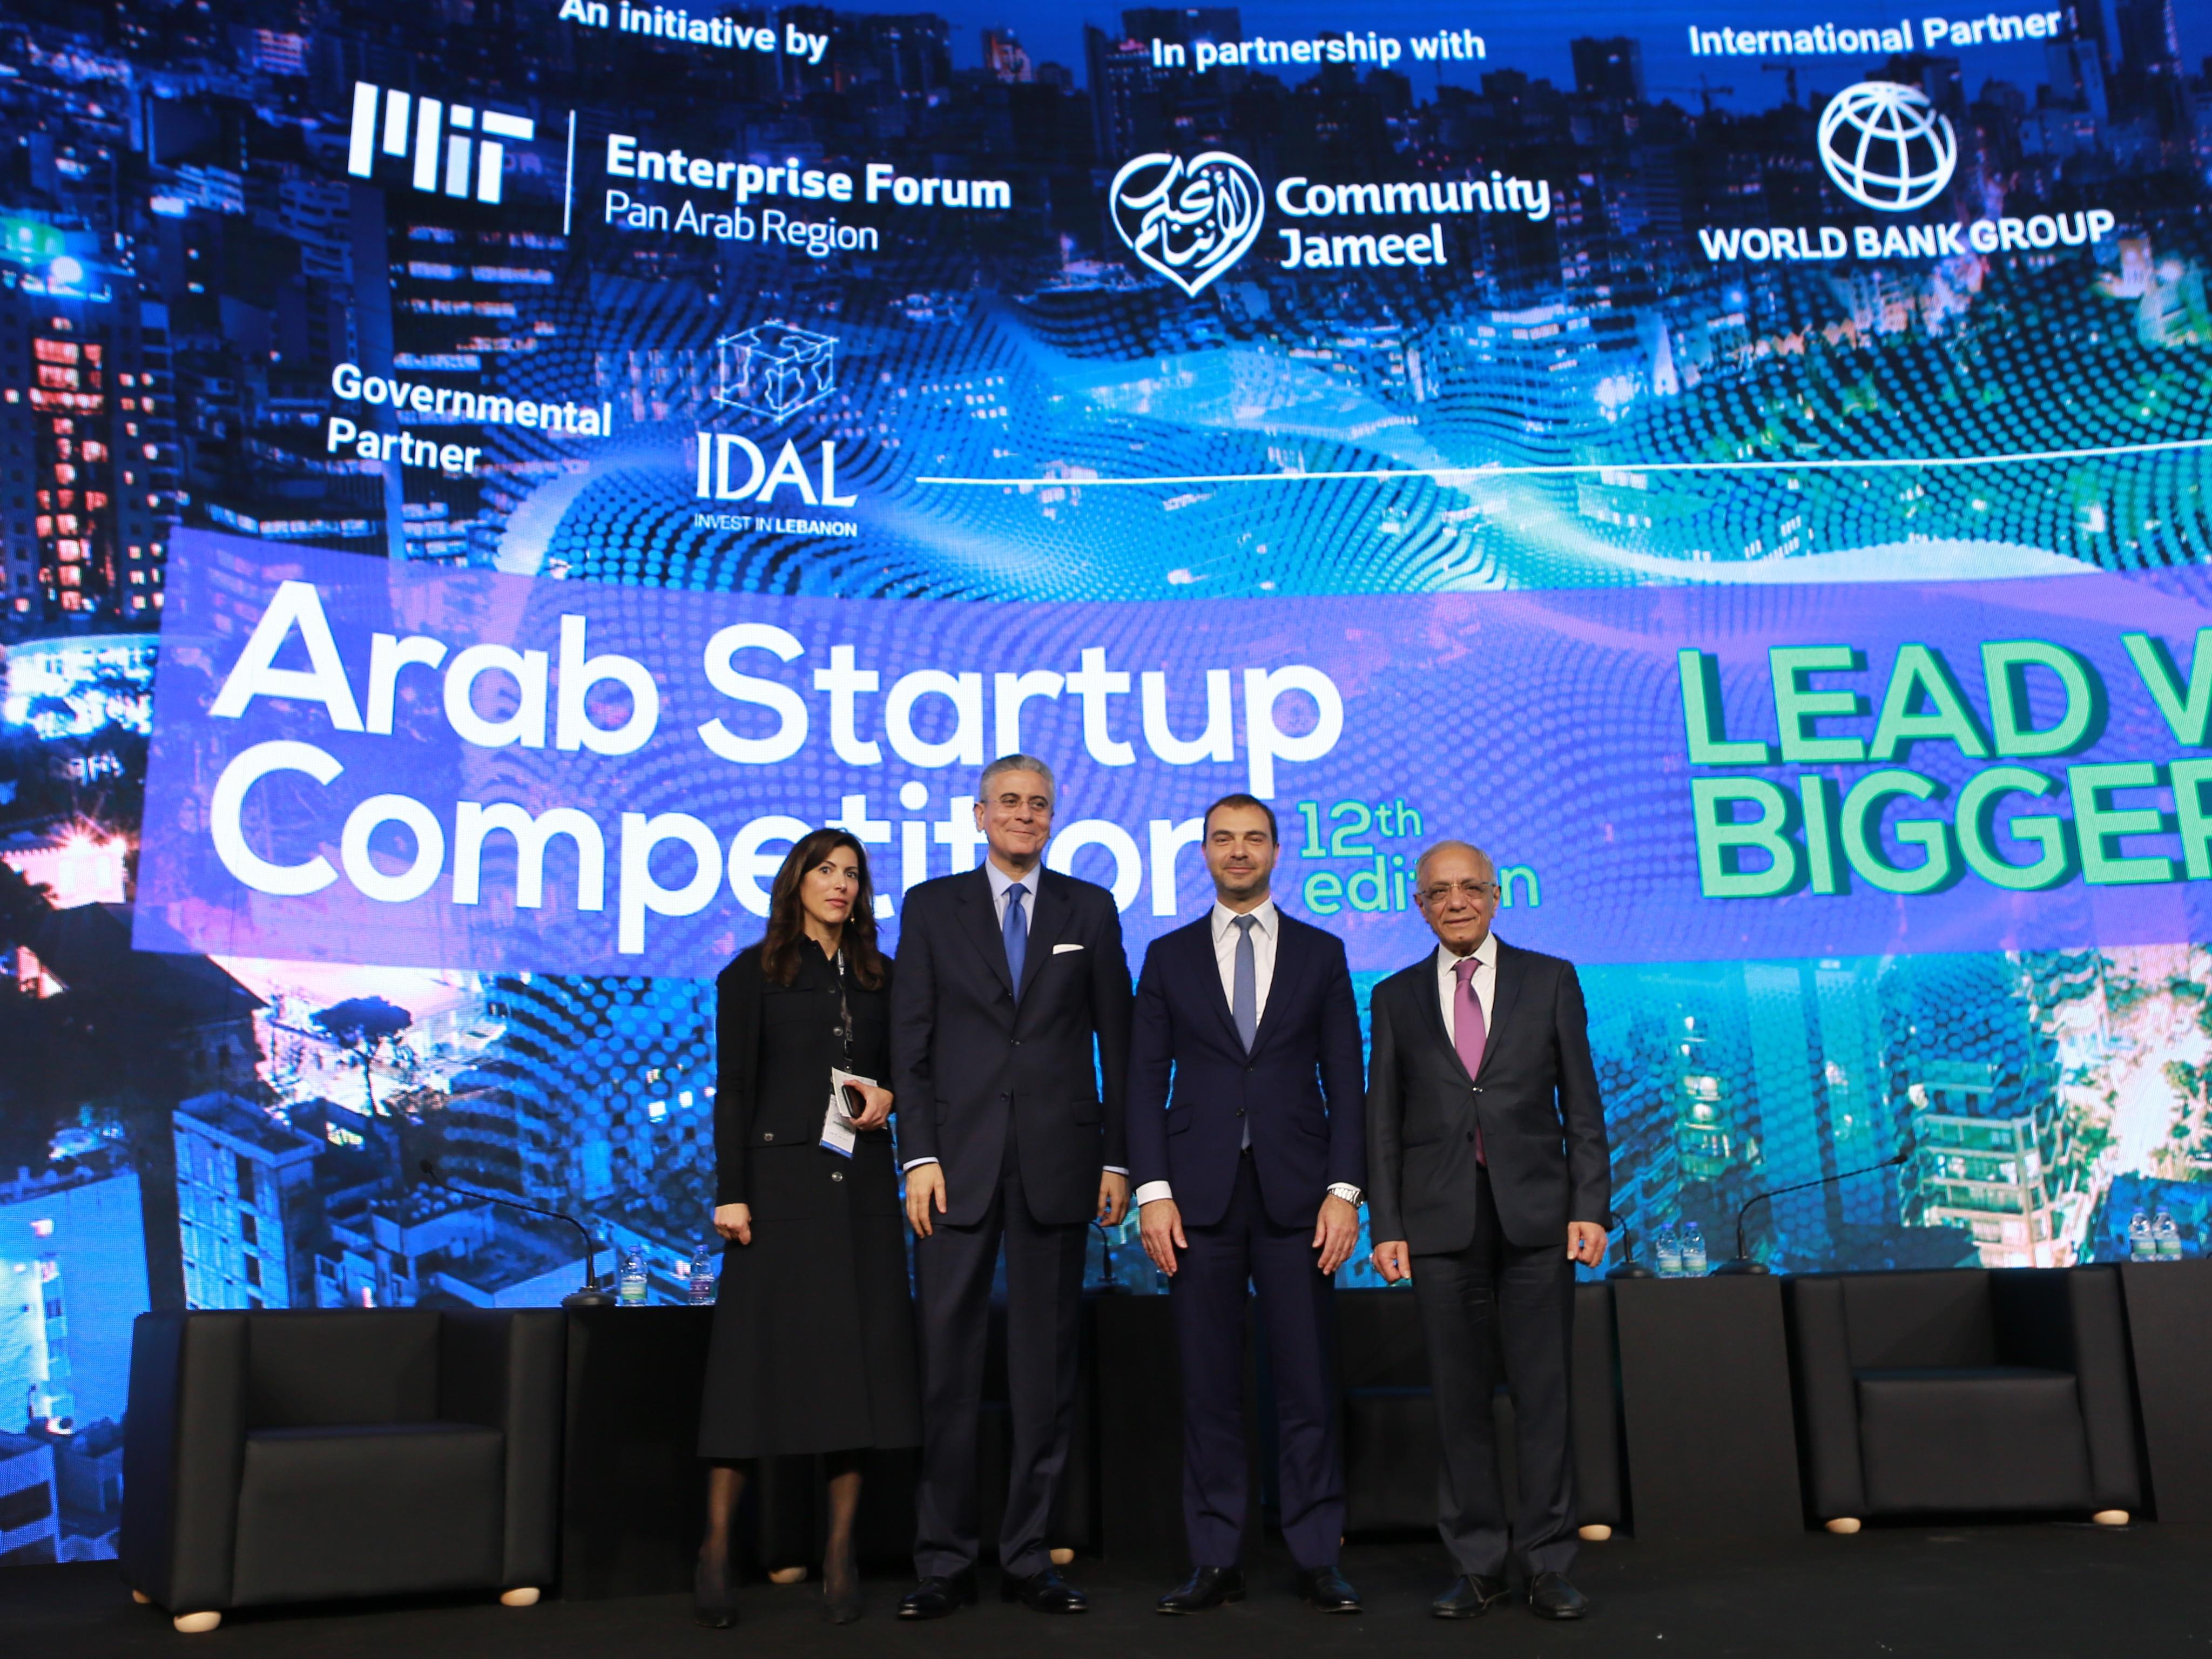 Abu Dhabi's Hub71 enables and supports MENA Startups With MIT Enterprise Forum Pan Arab Partnership